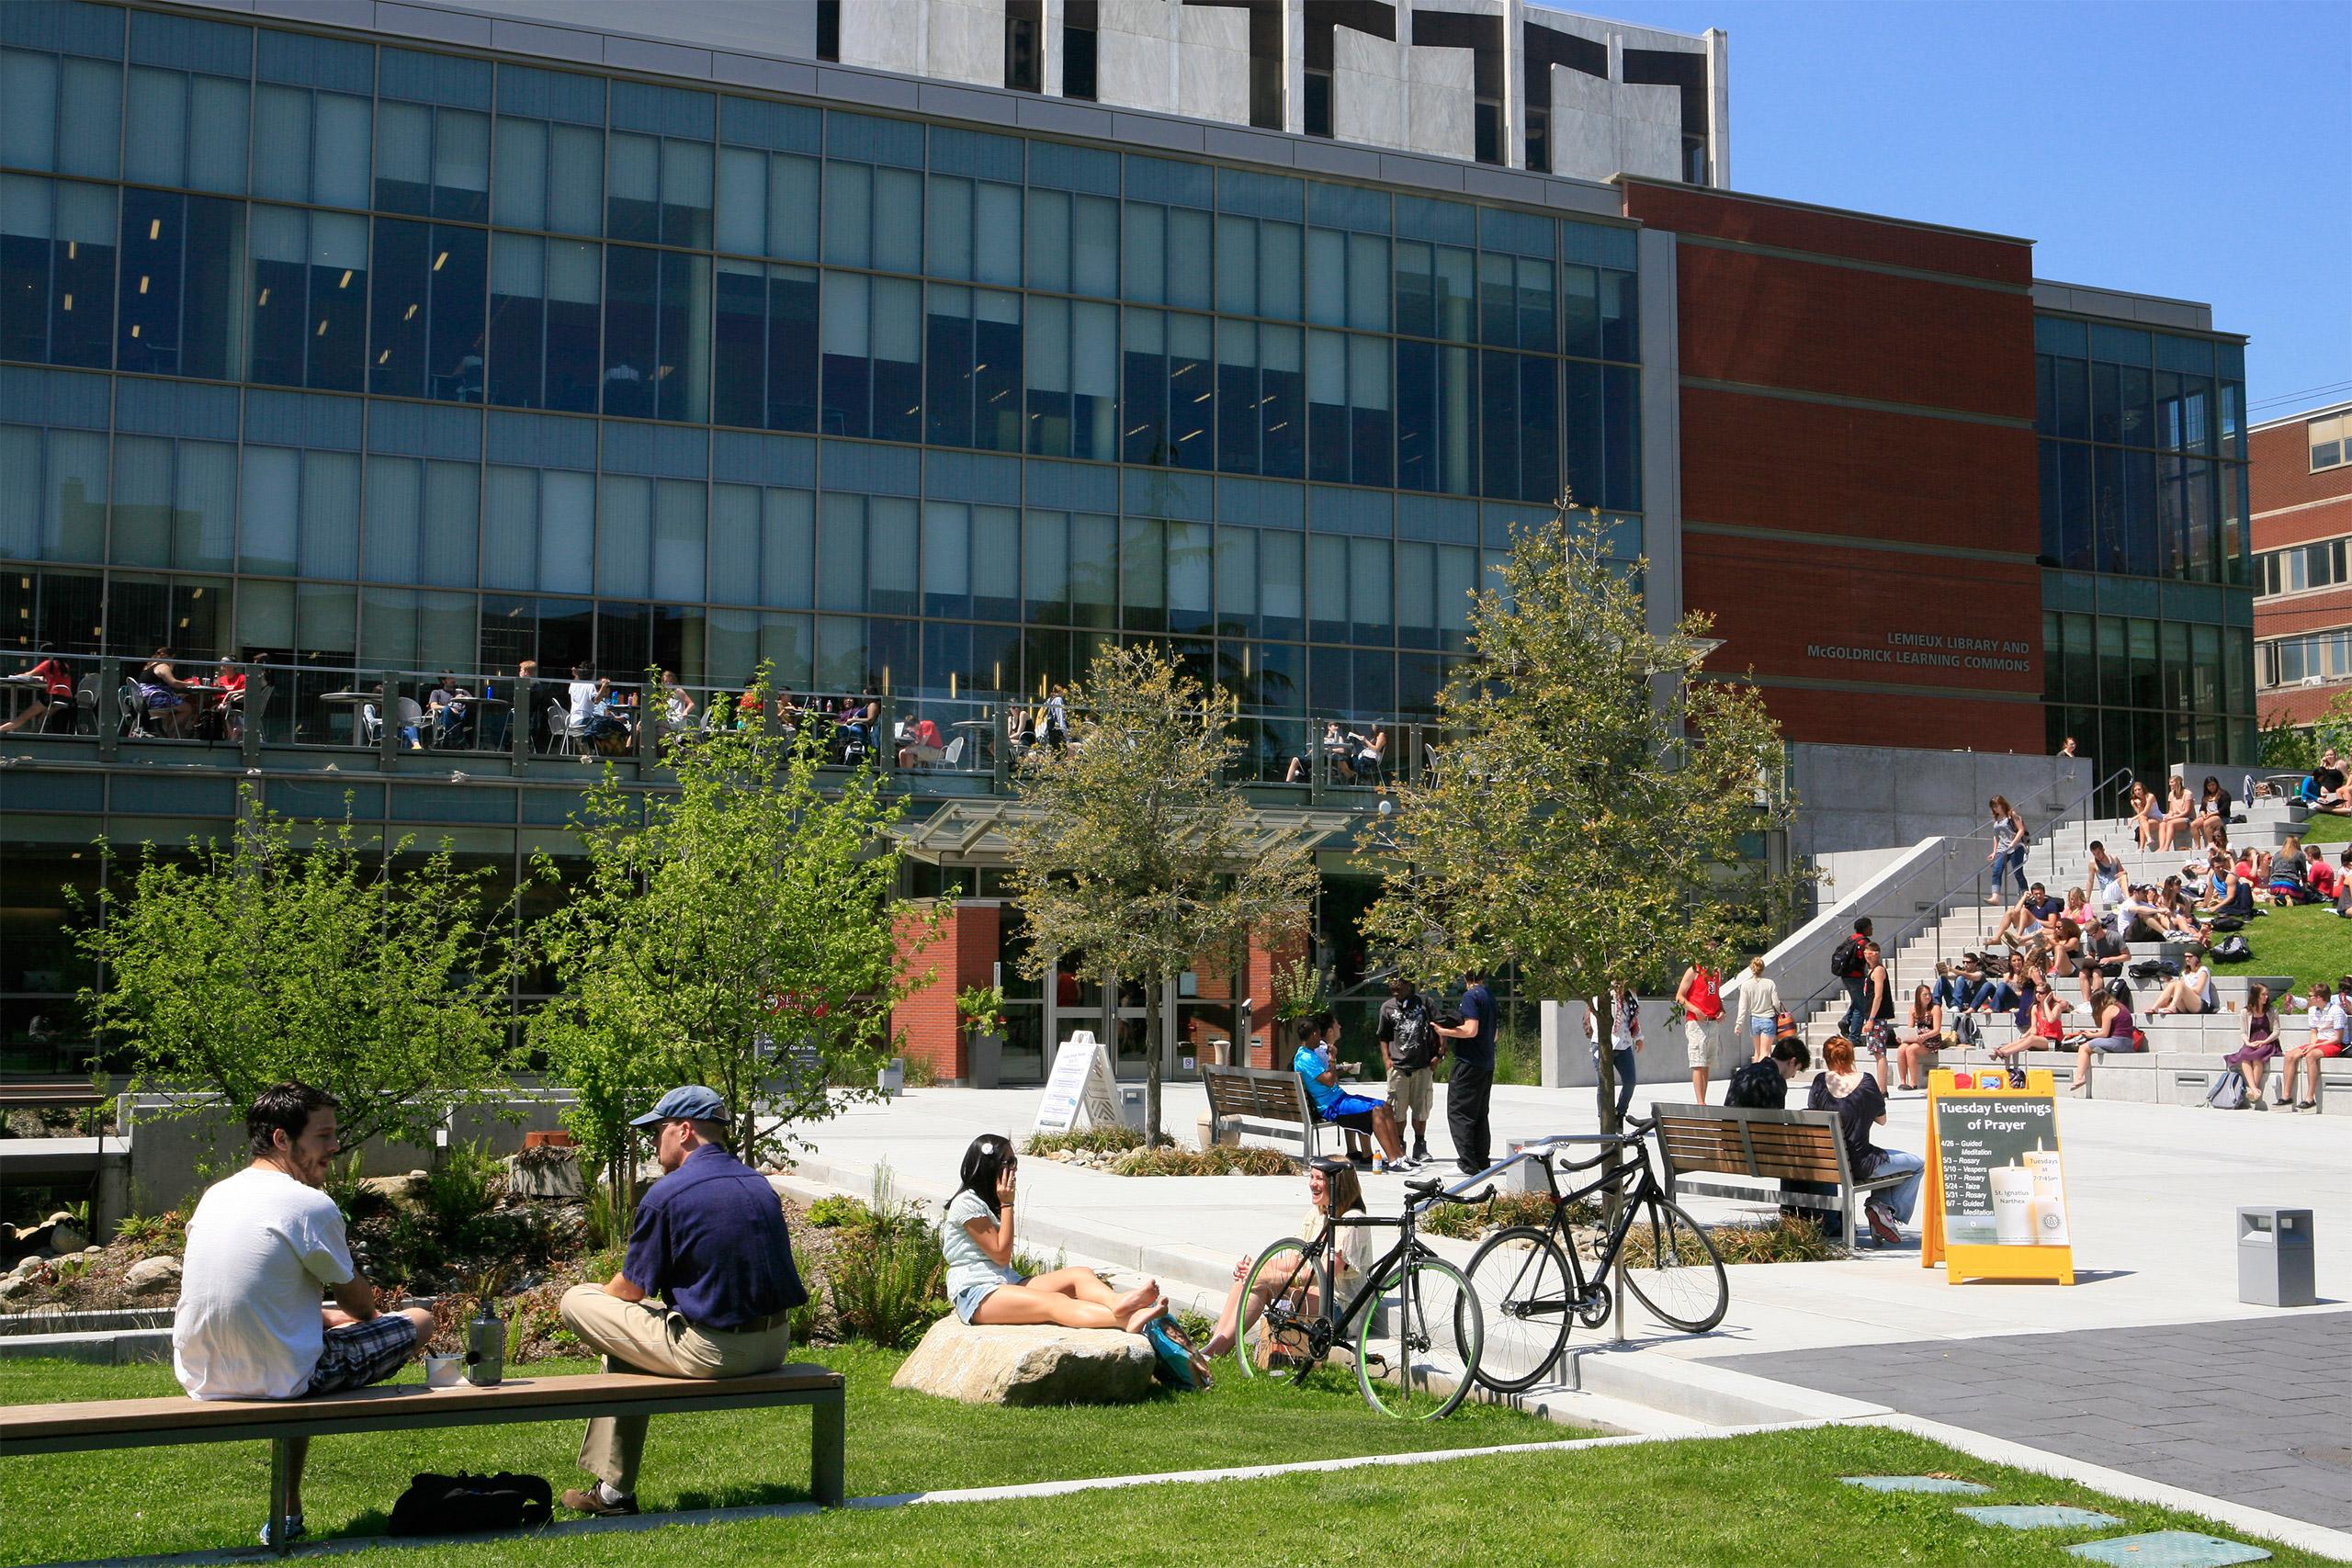 Seatle University